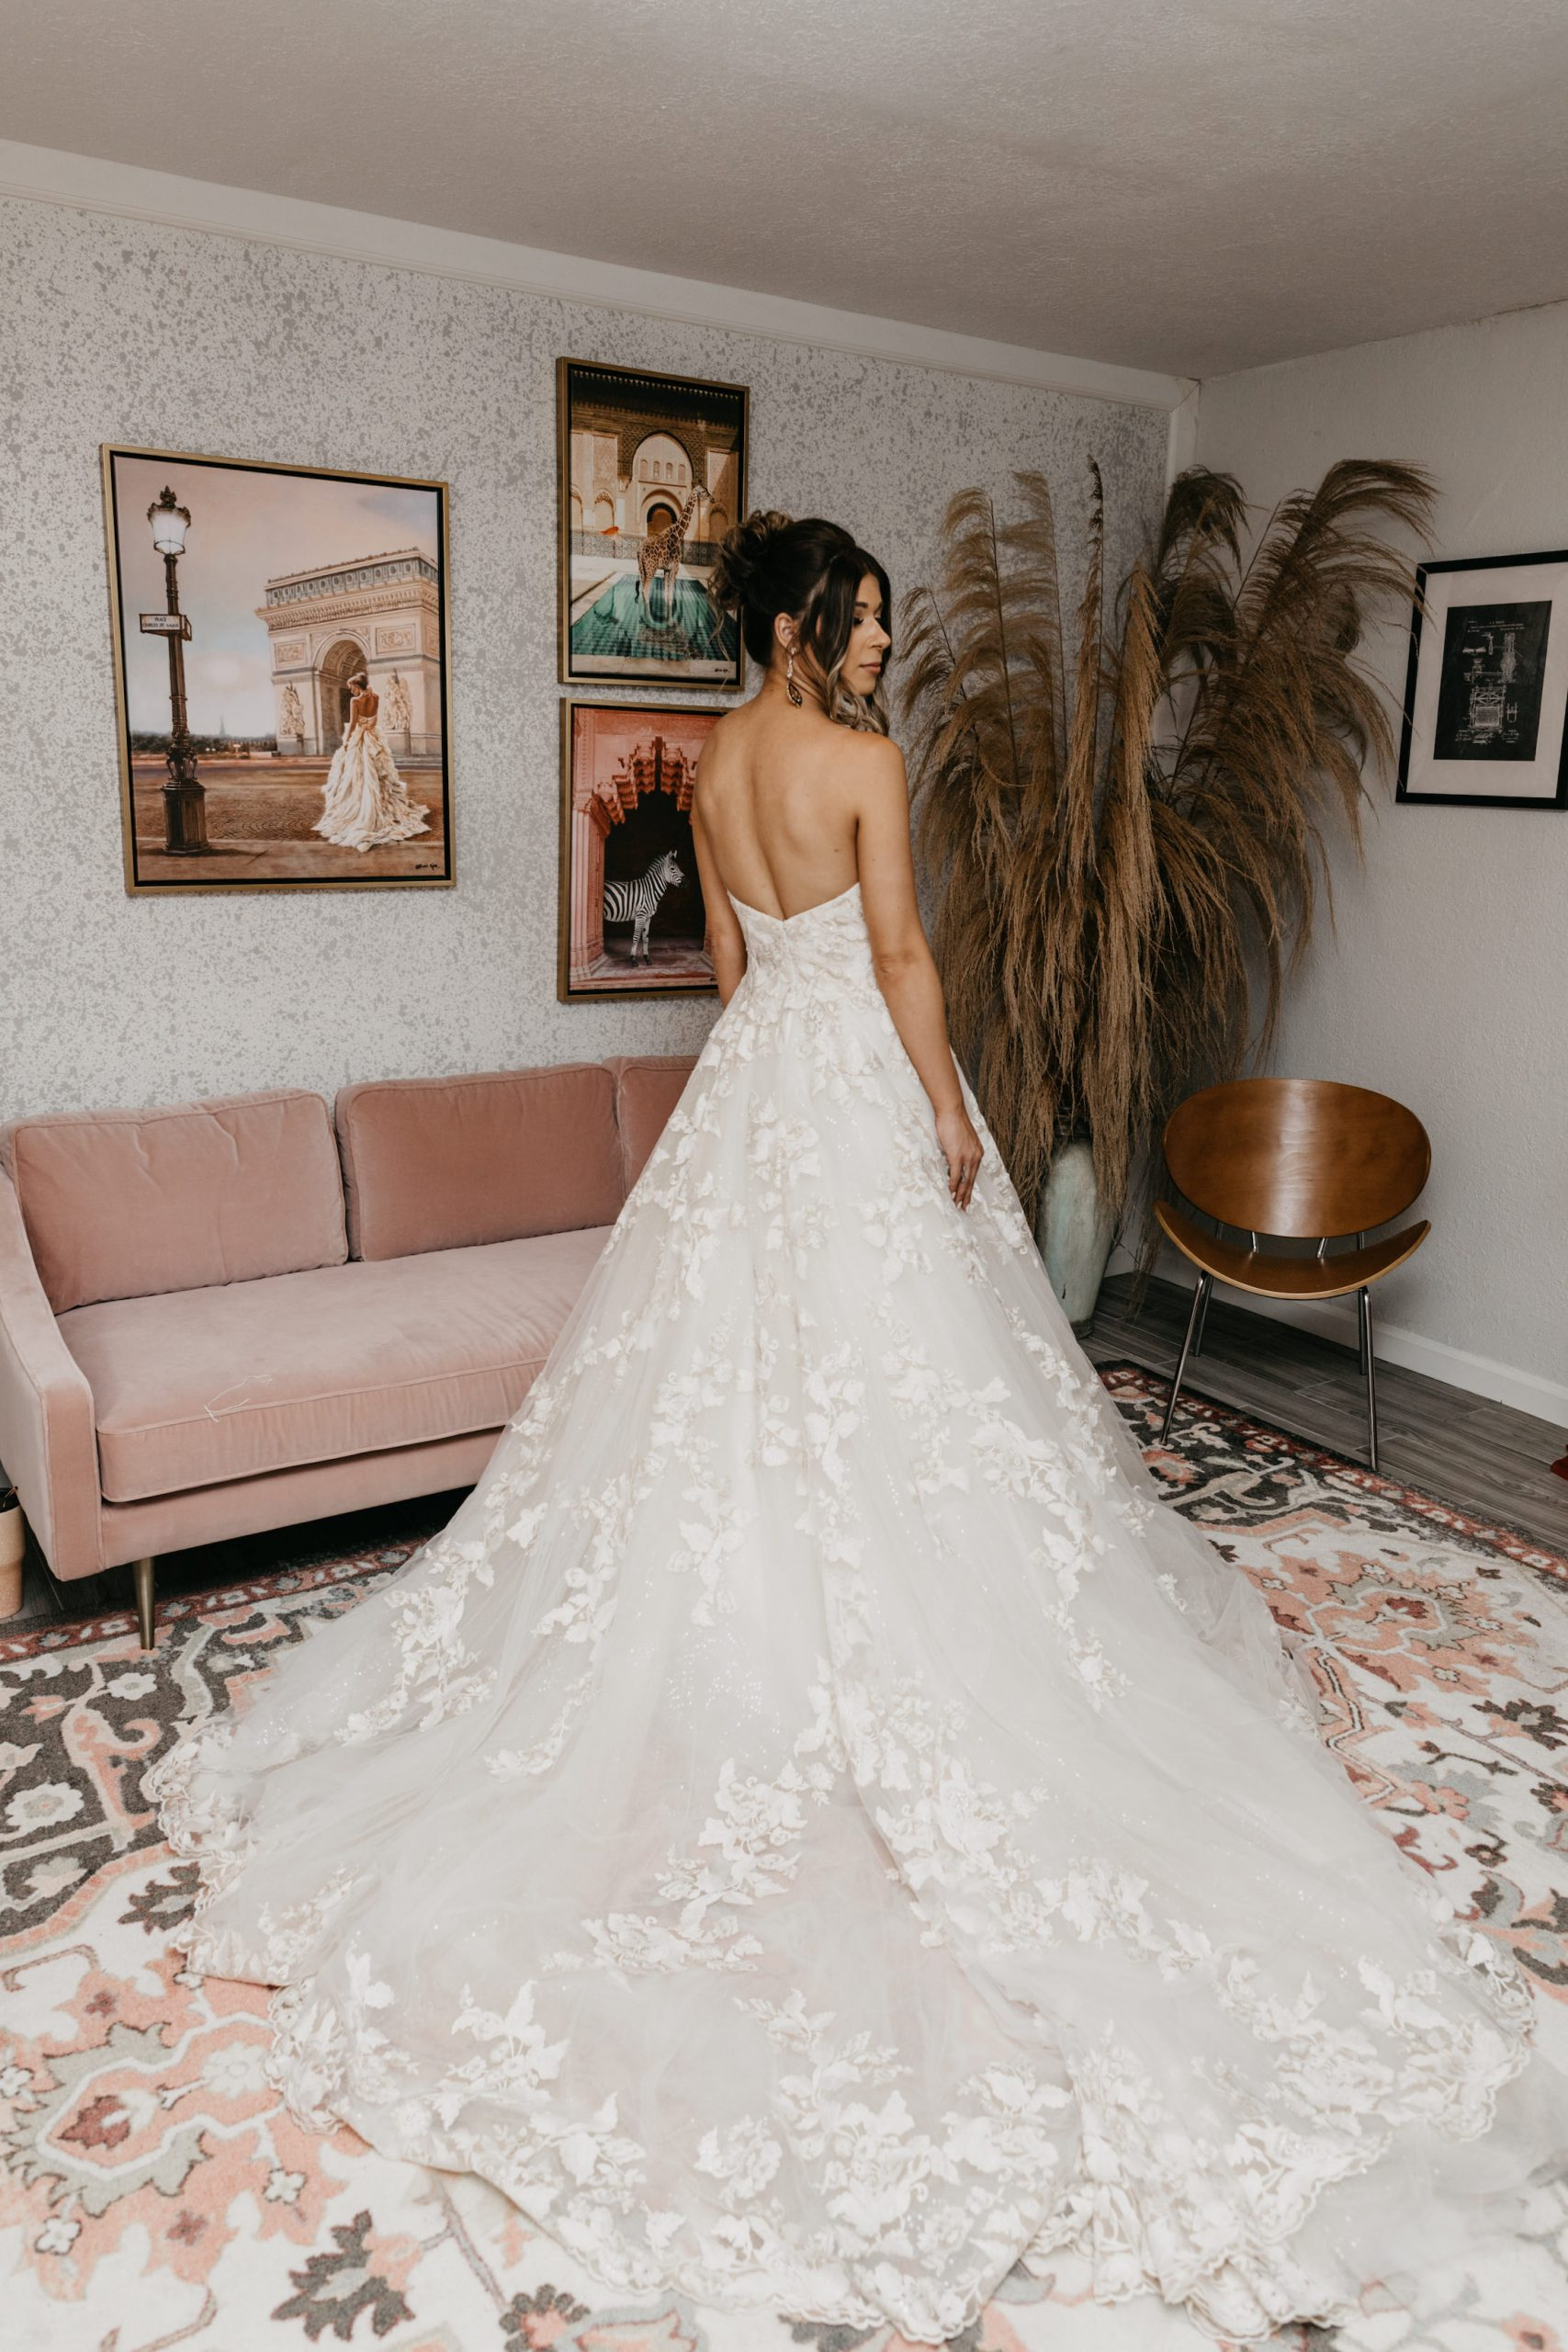 Evanelle Vineyards Wedding Bridal Suite, image by Fatima Elreda Photo